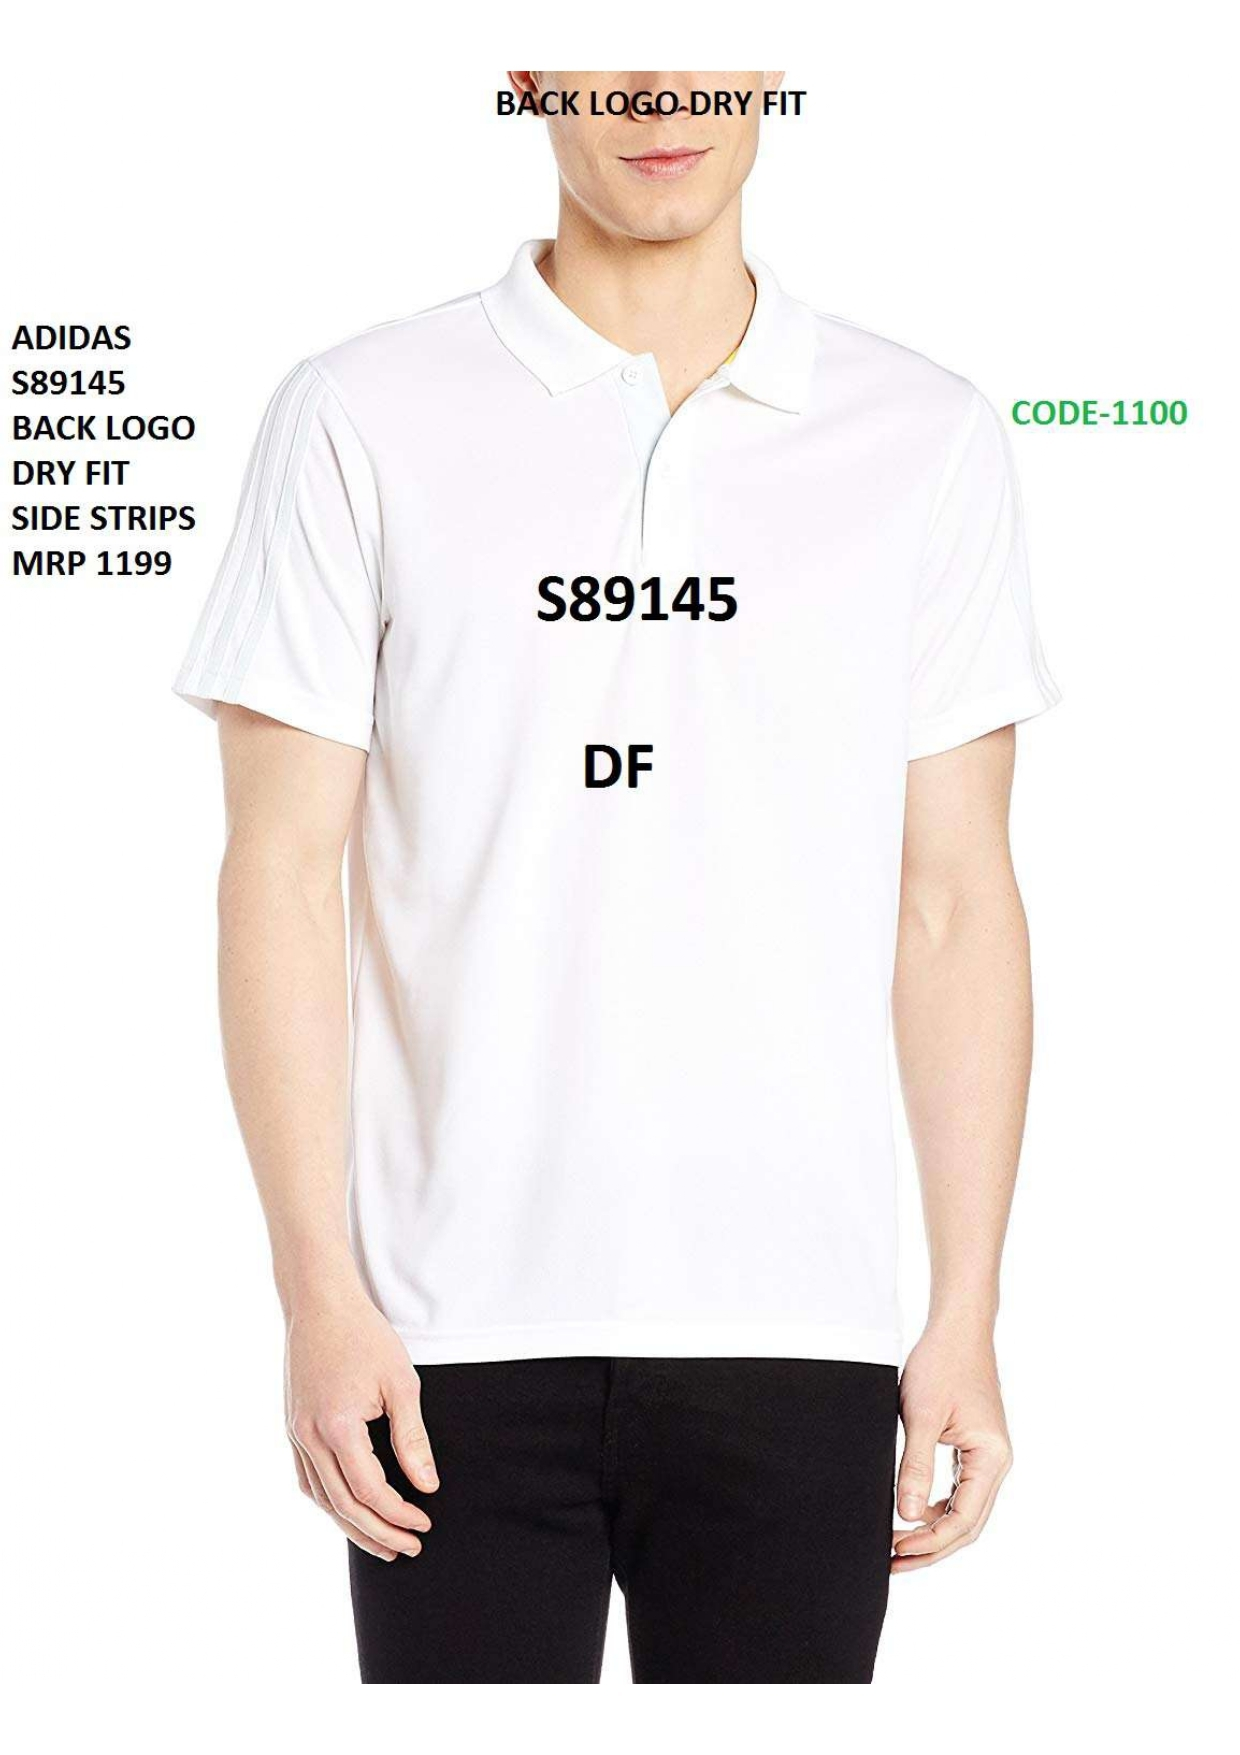 Adidas Stripped T Shirt